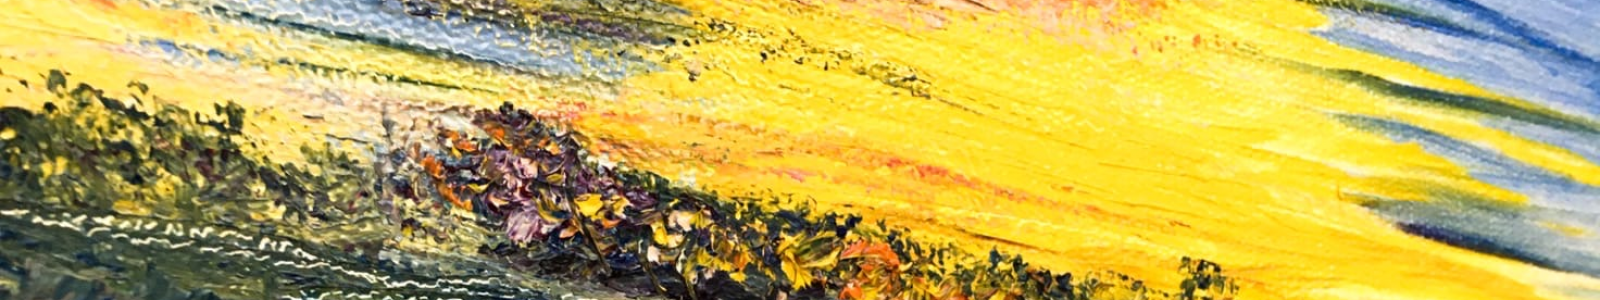 Gallery Artist Irina Kudryavtseva